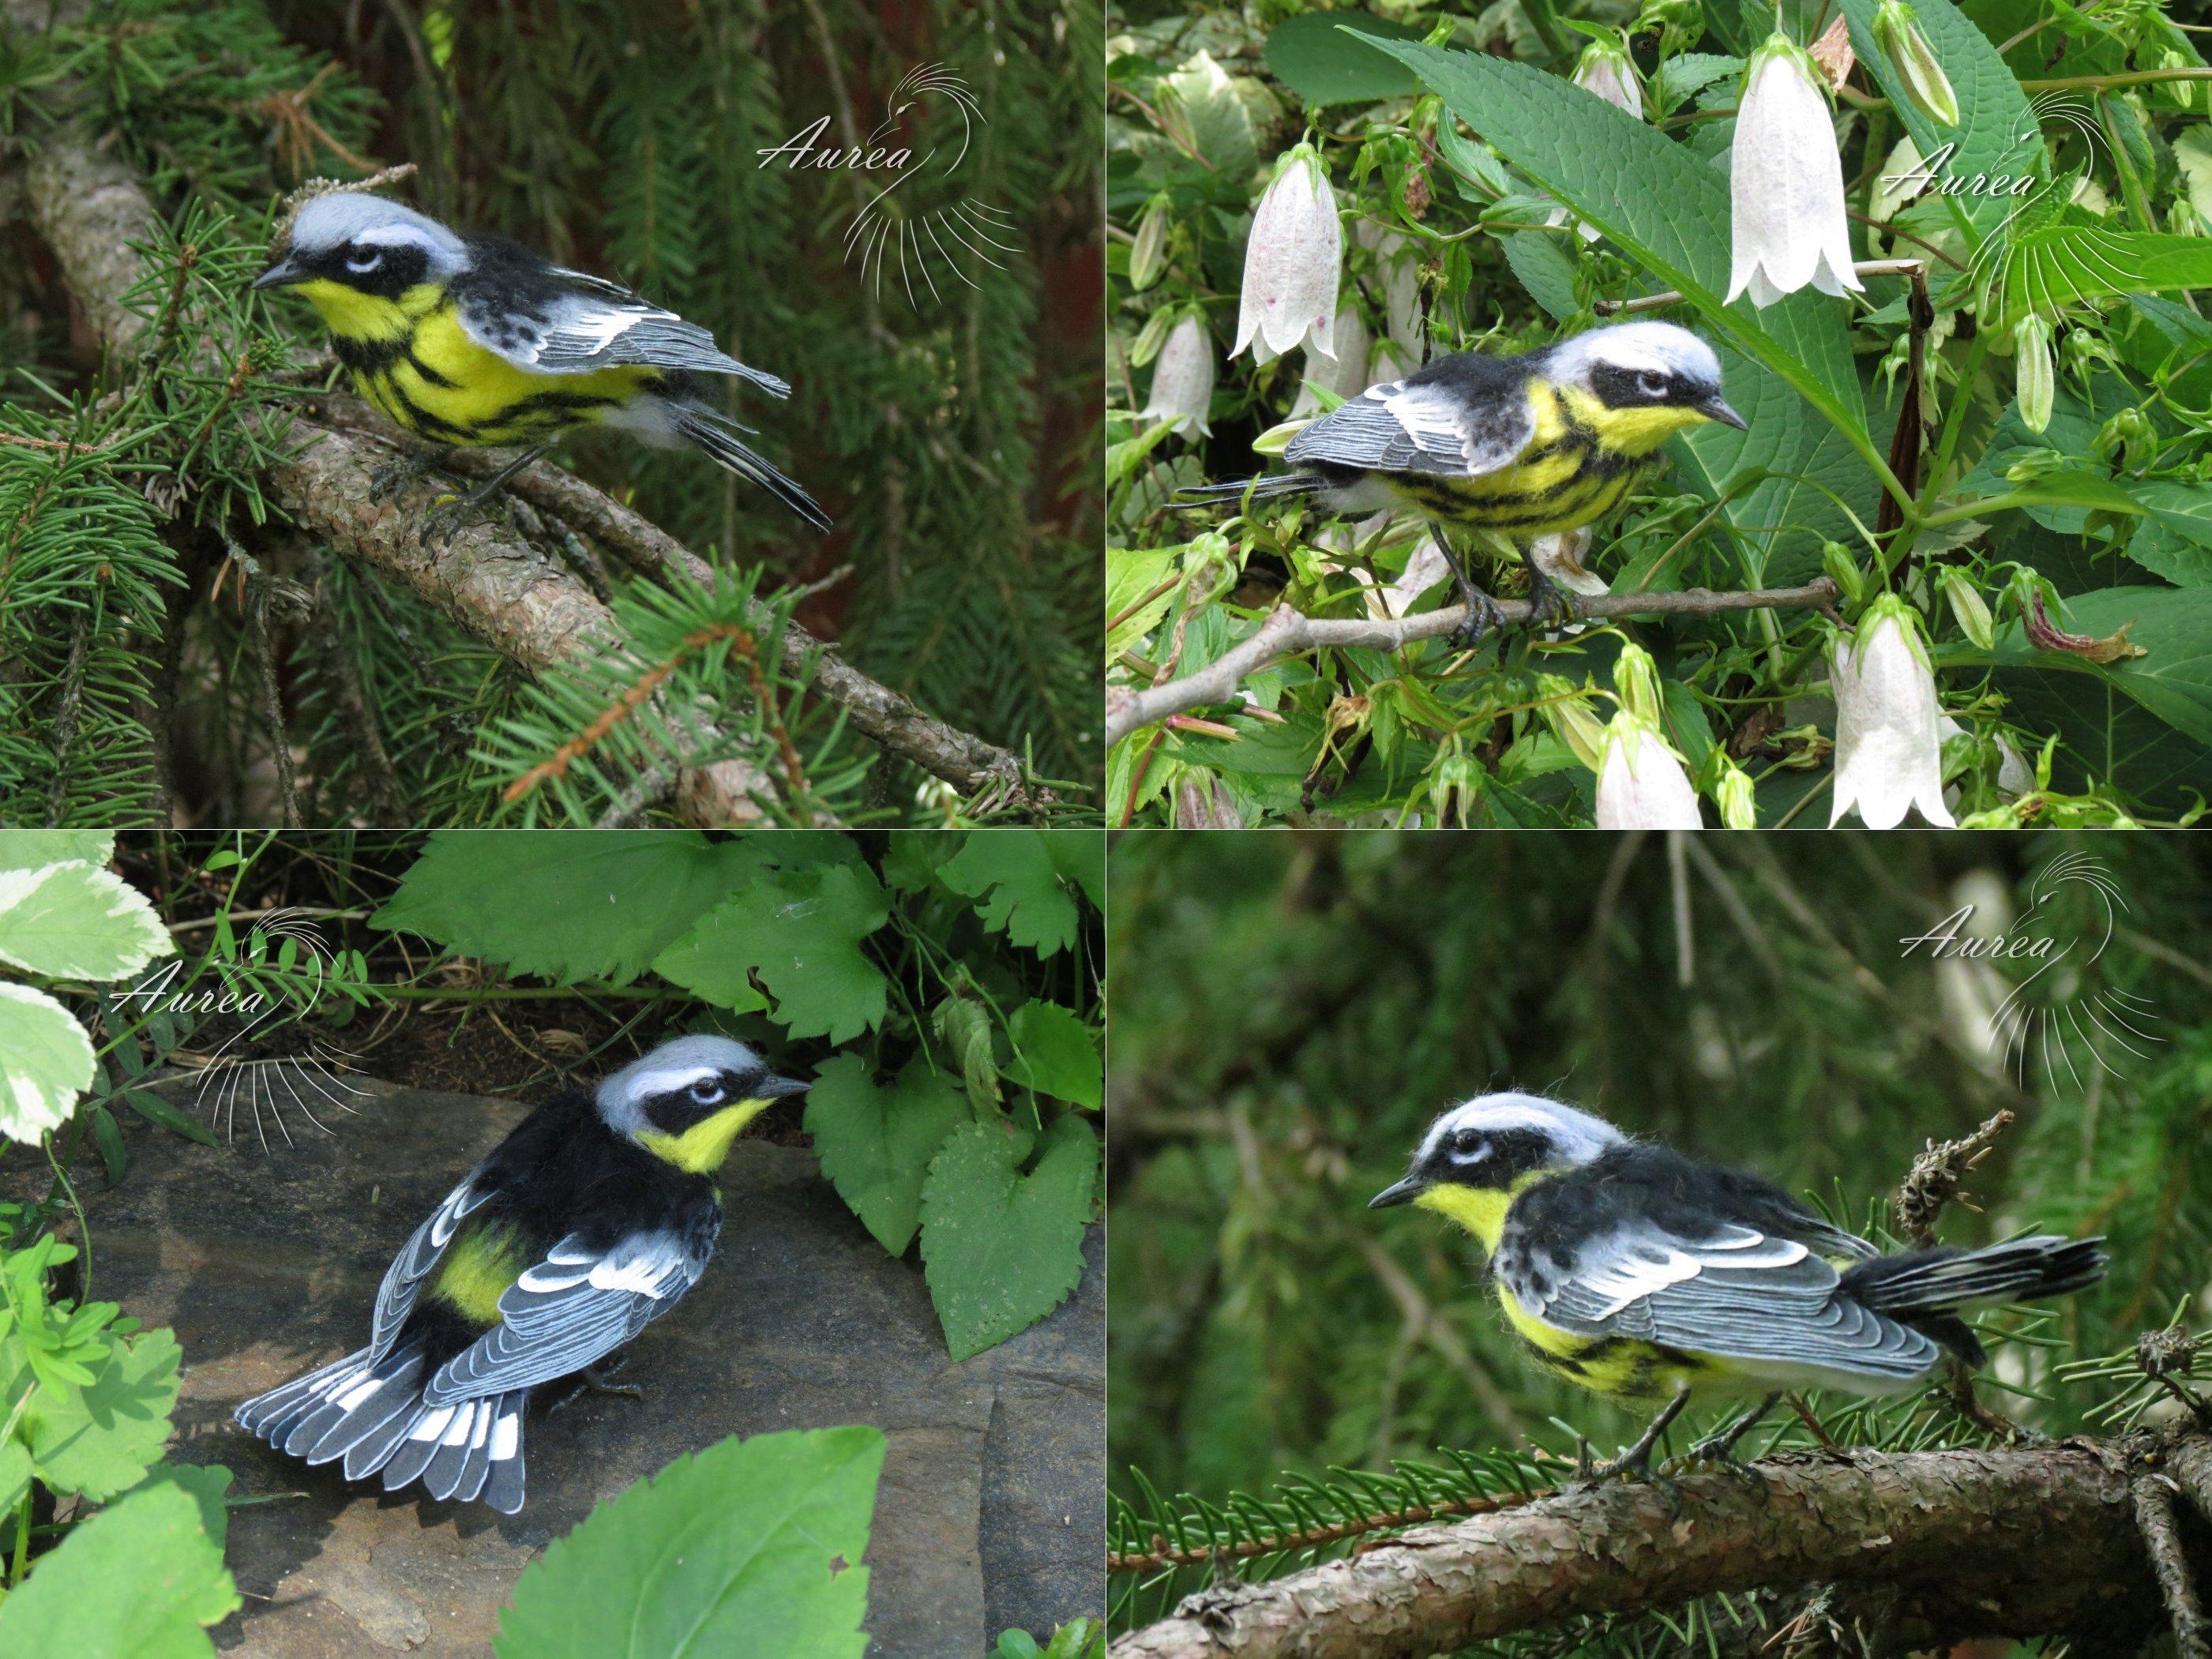 [Needle felted] Magnolia warbler